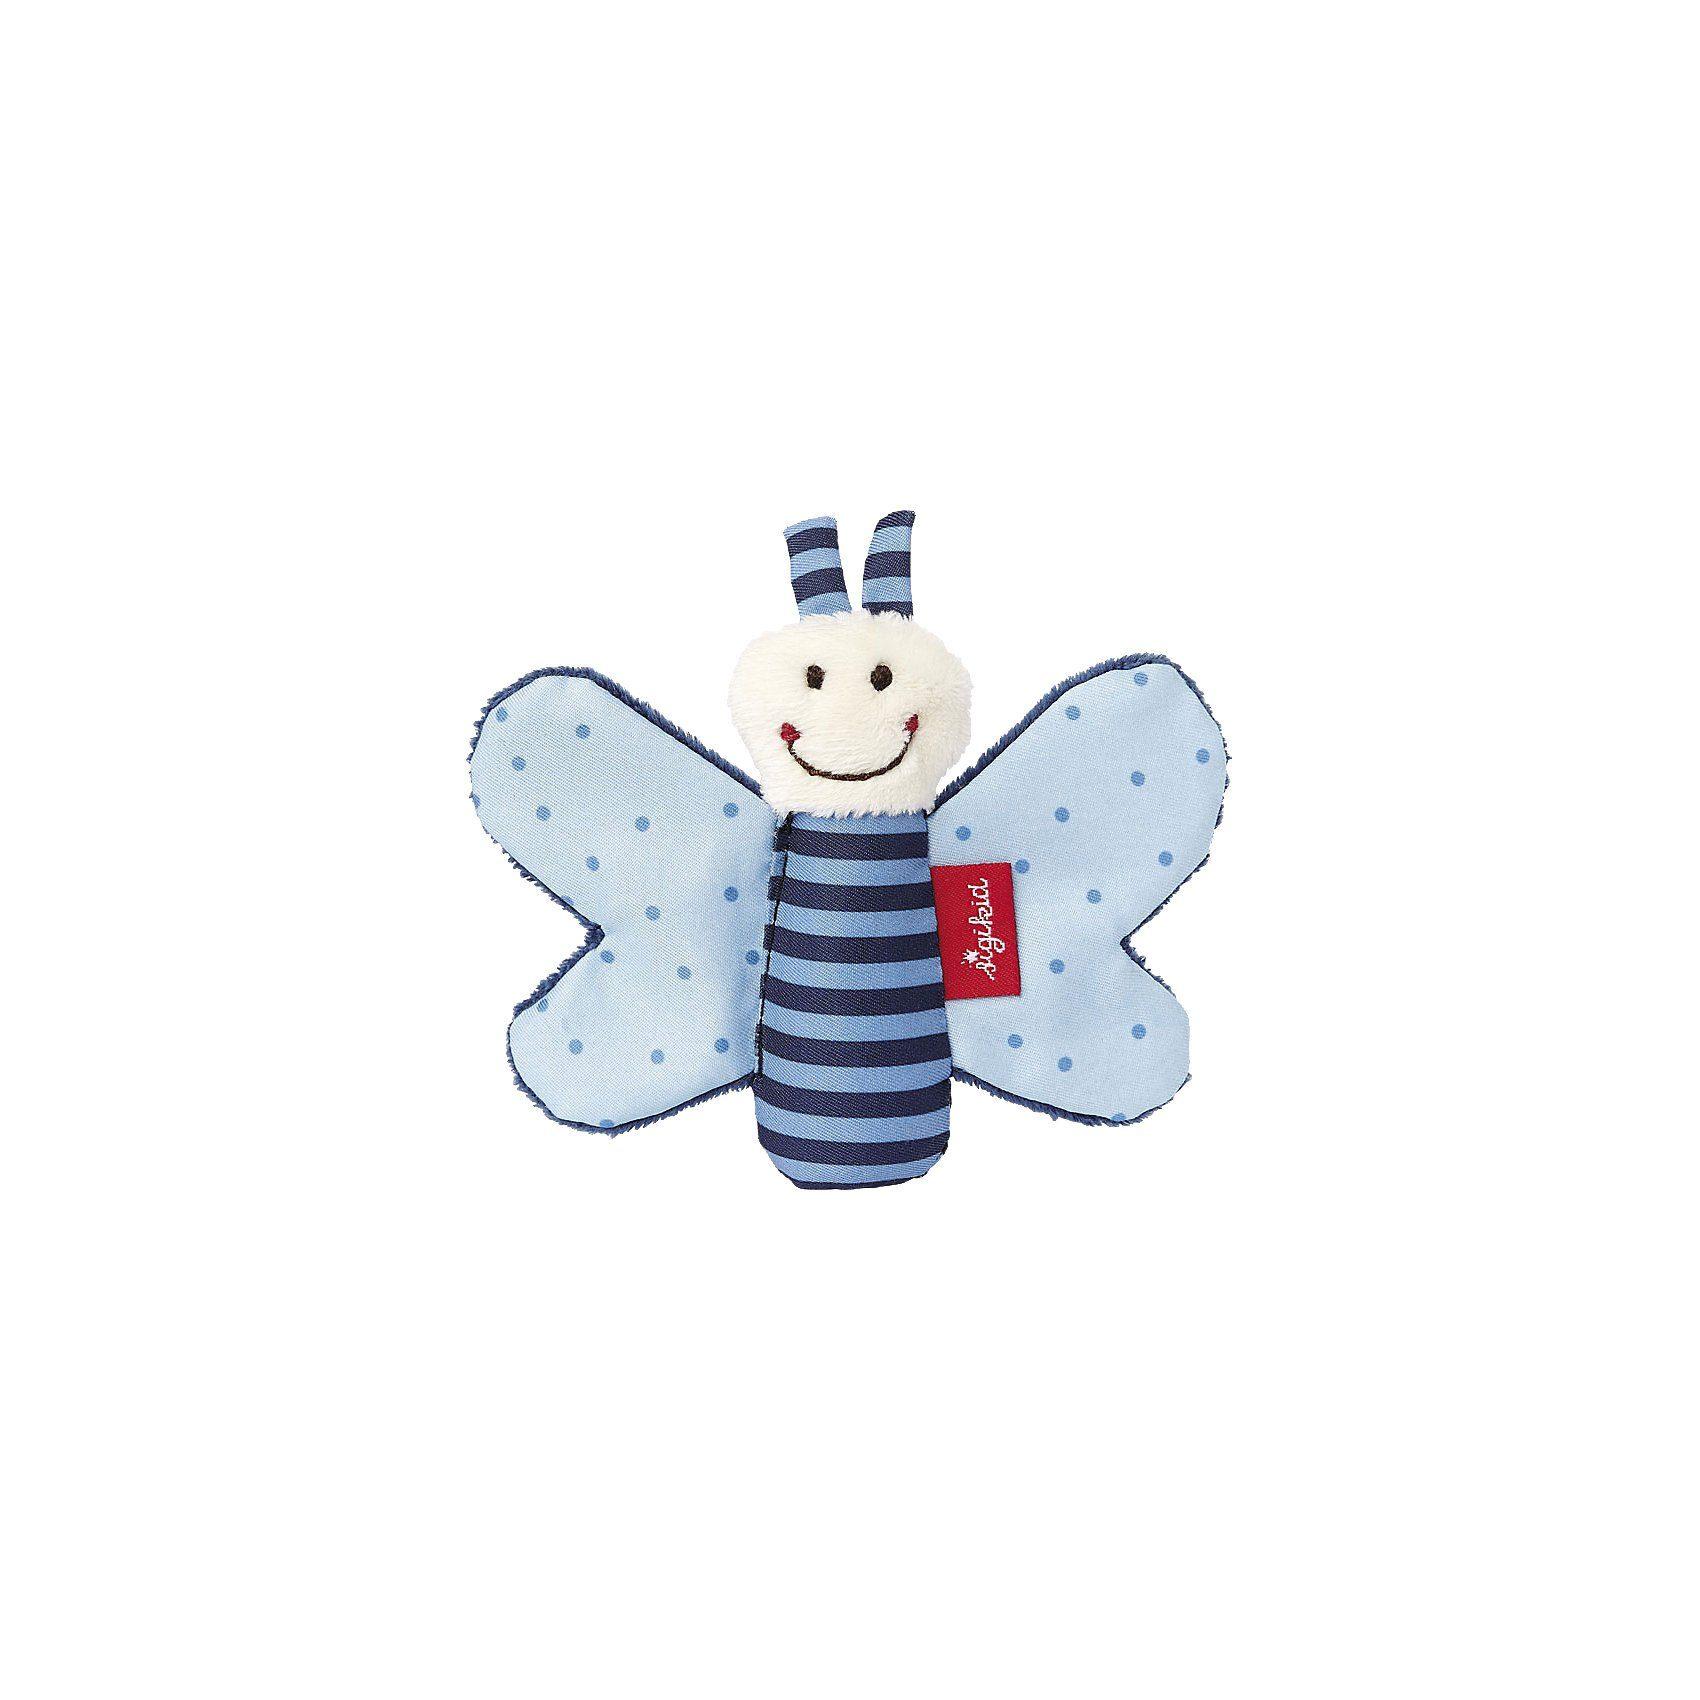 Sigikid Knister-Schmetterling, blau (41180)